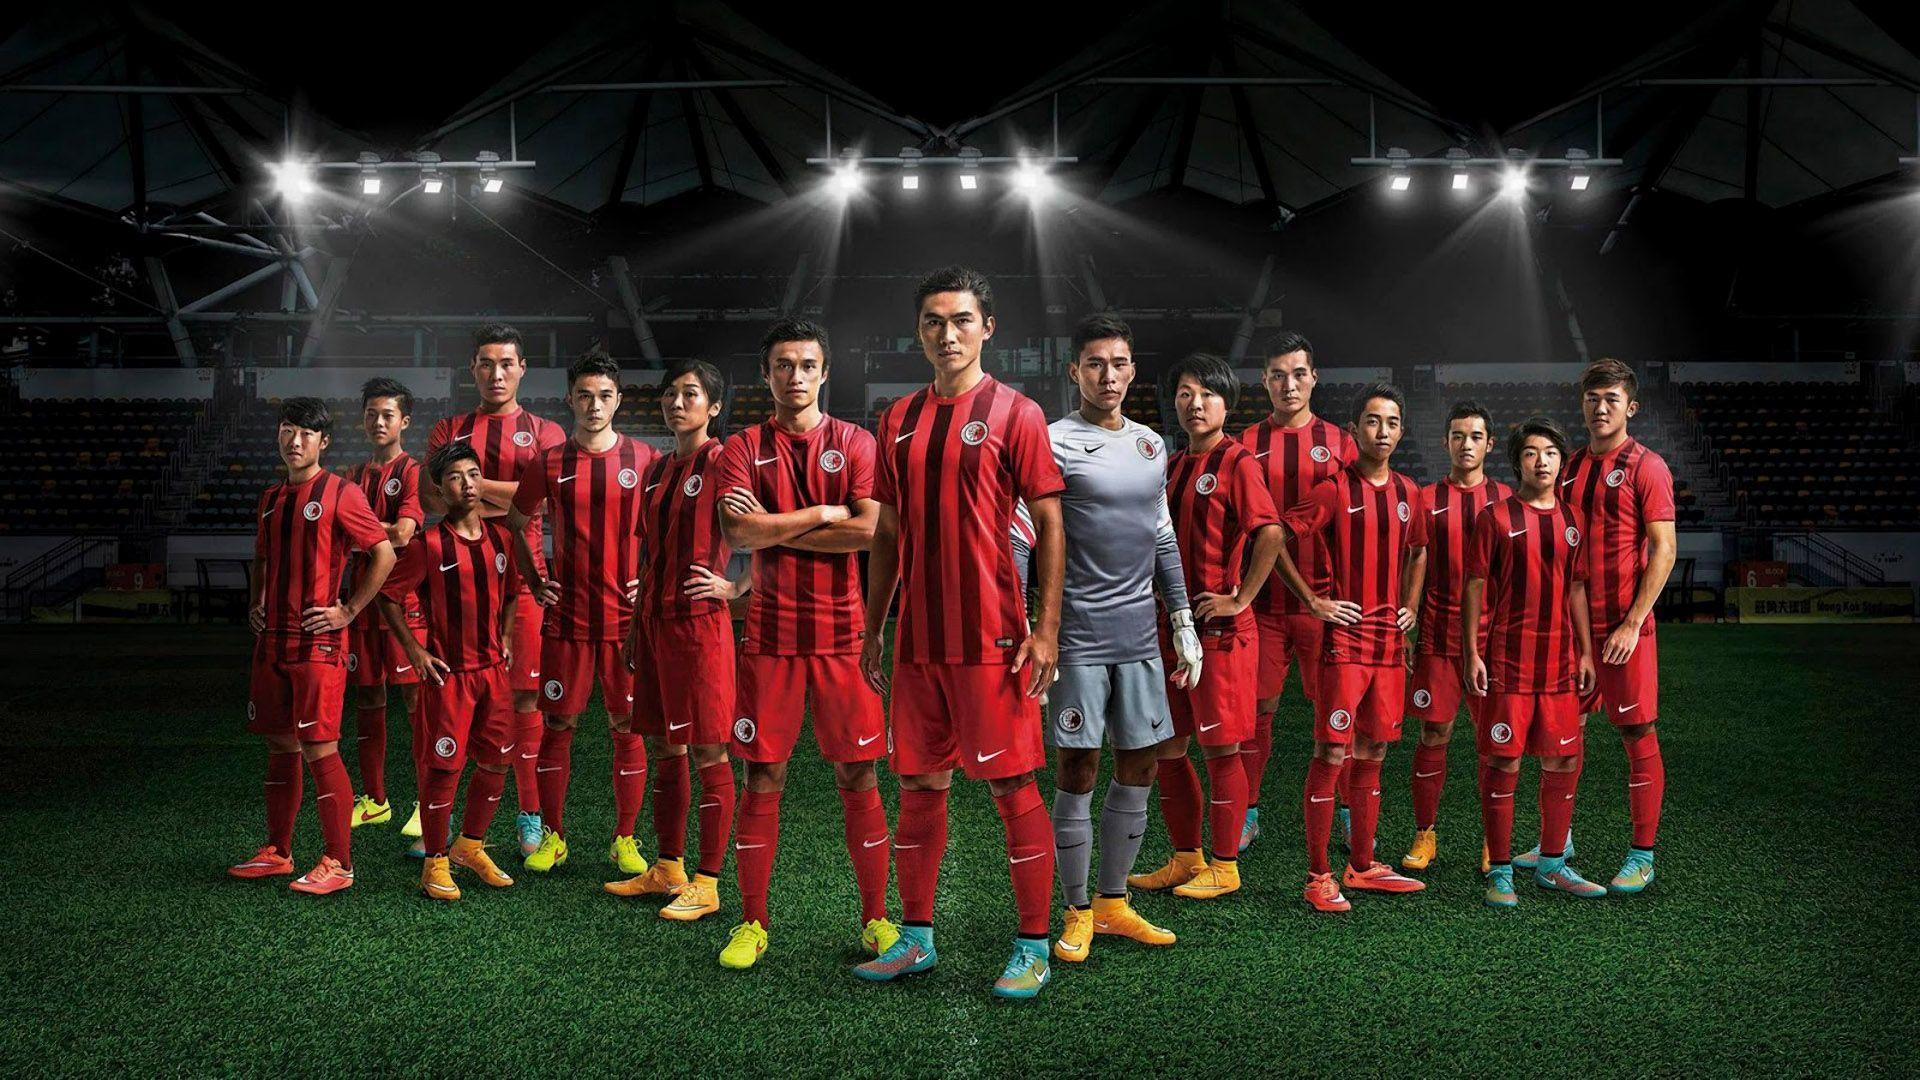 Football-Hd-wallpaper-wp4006497